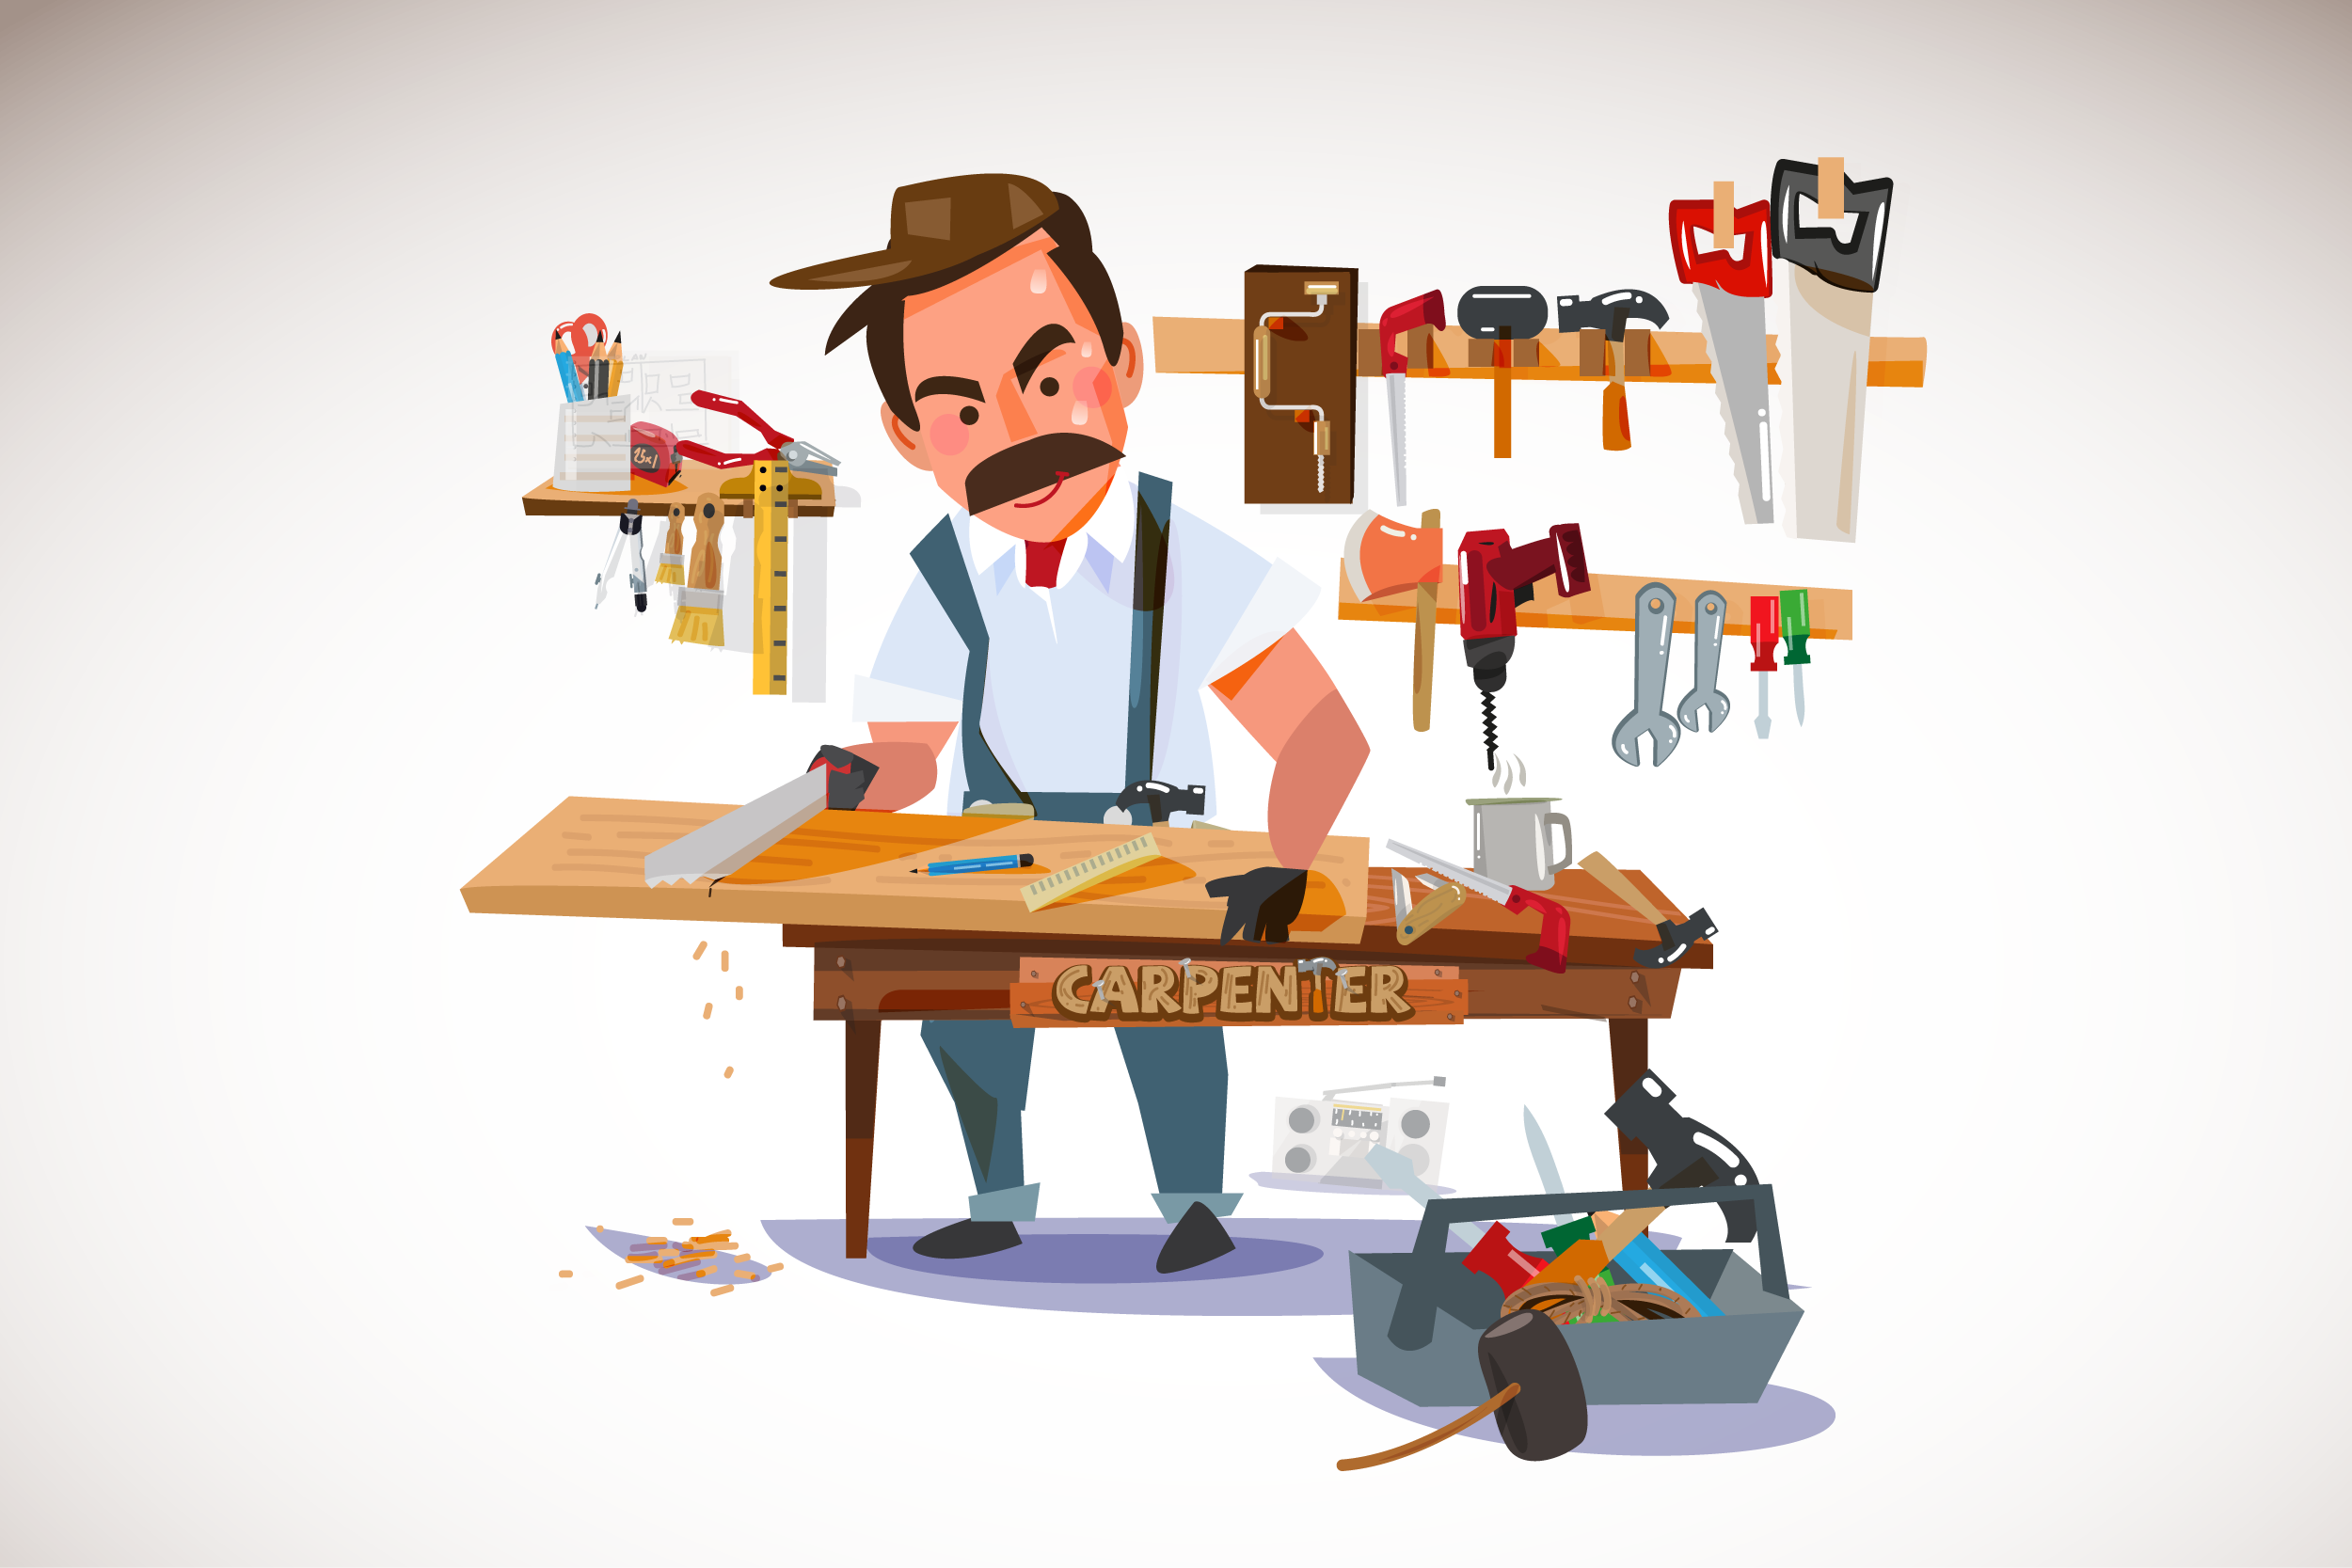 hire a carpenter